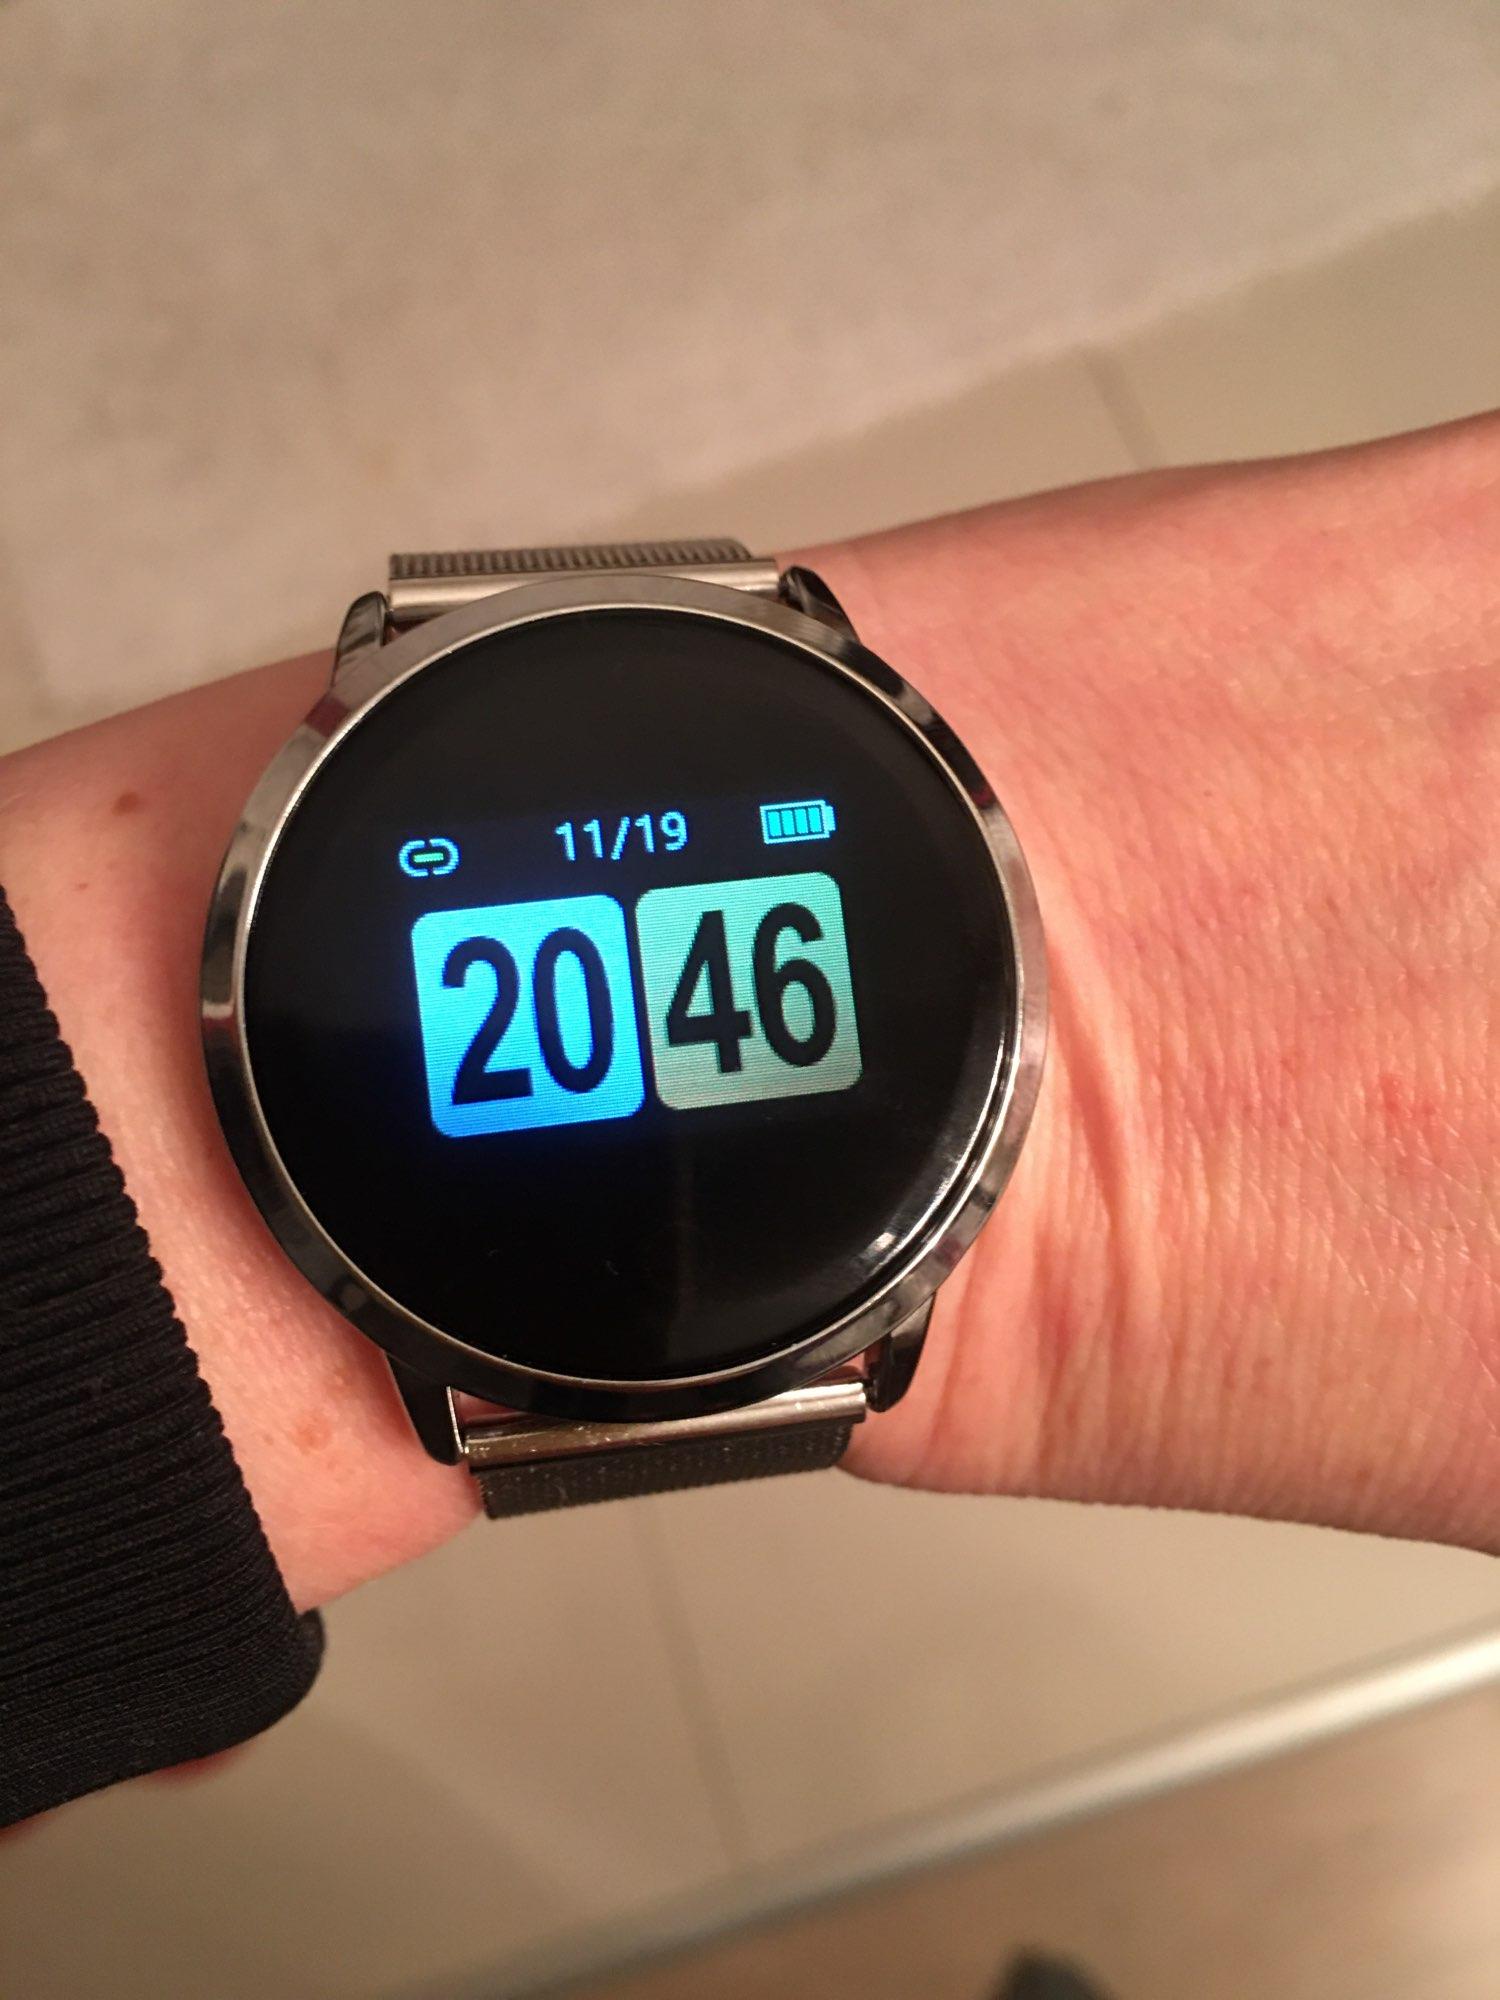 CYUC Q8 Smart Watch OLED Color Screen men Fashion Fitness Tracker Heart Rate Monitor Blood Pressure Oxygen Pedometer Smartwatch Smart Watches    - AliExpress